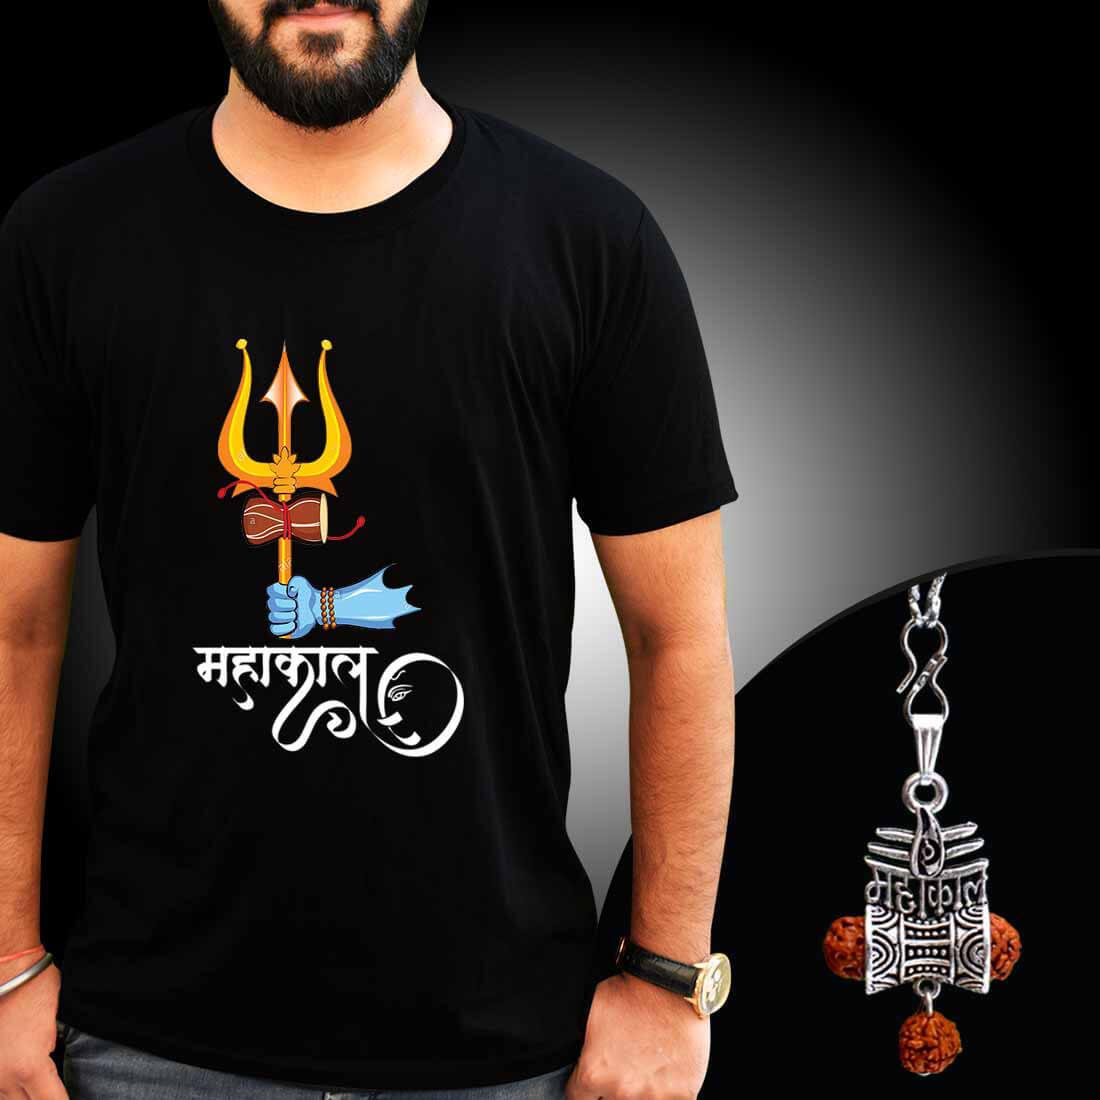 Mahakal Trishul Printed T Shirt Combo With Mahakal Locket